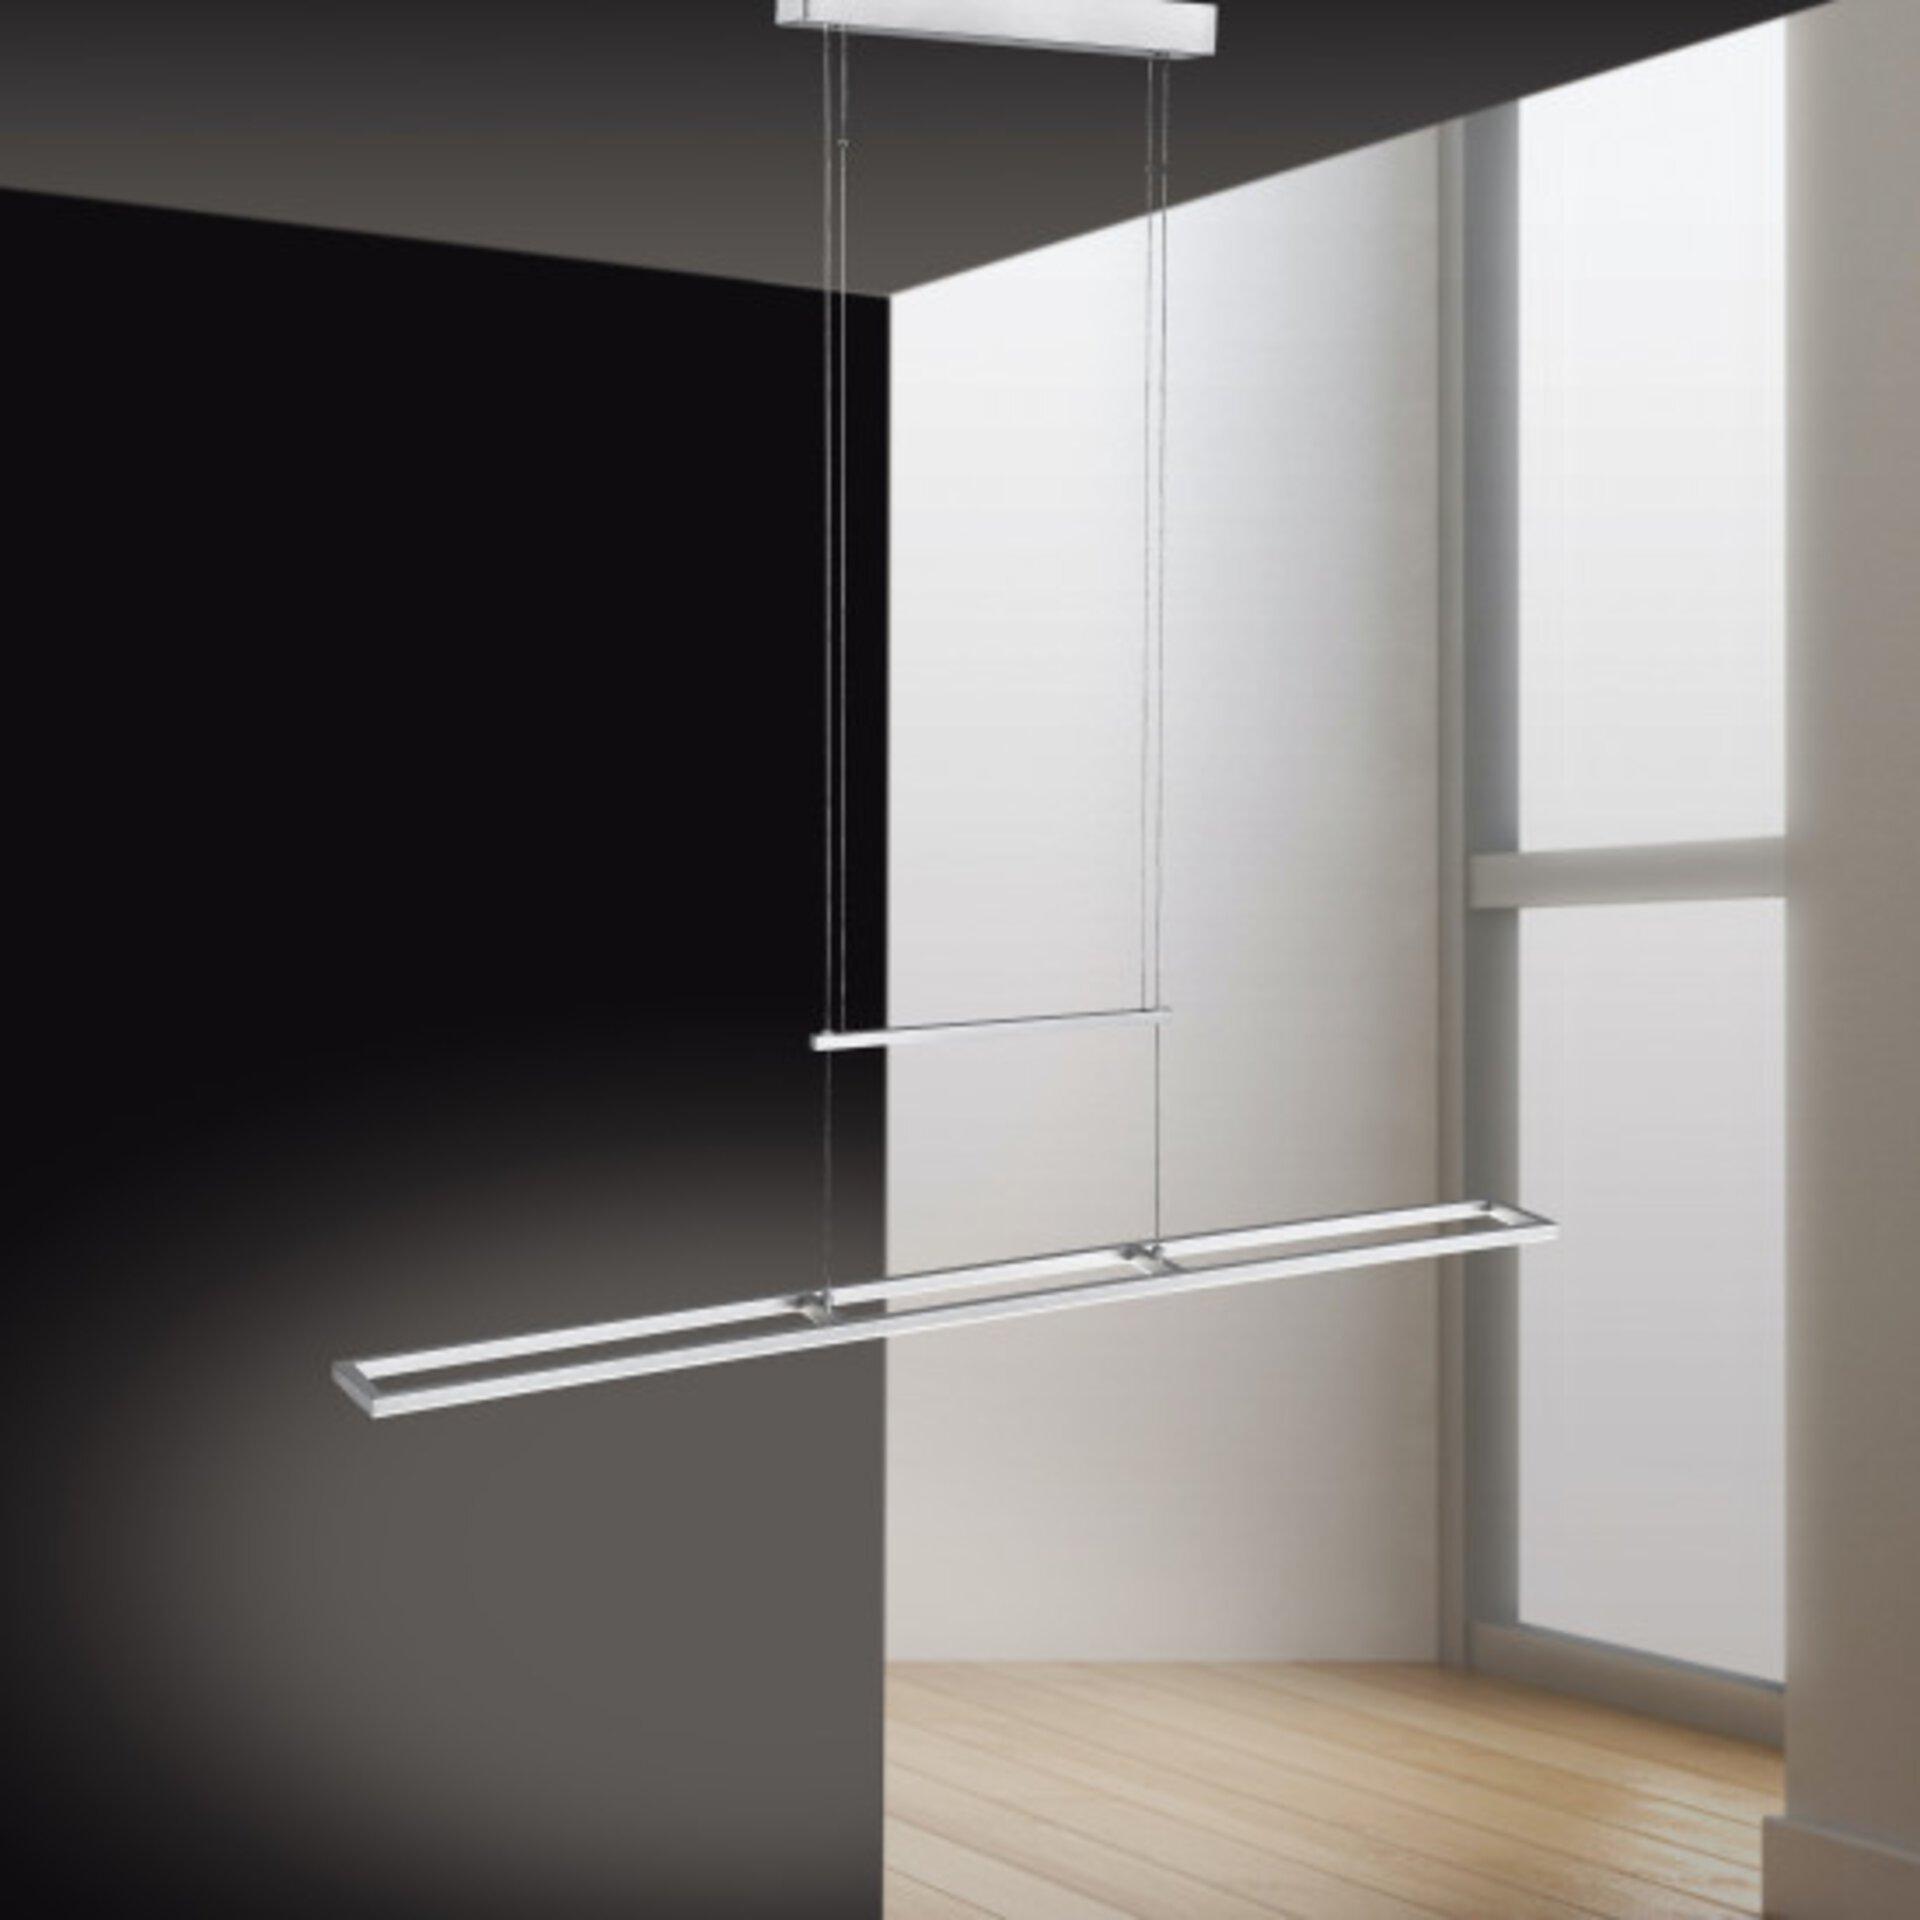 Hängeleuchte INIGO Paul Neuhaus Metall silber 10 x 160 x 110 cm